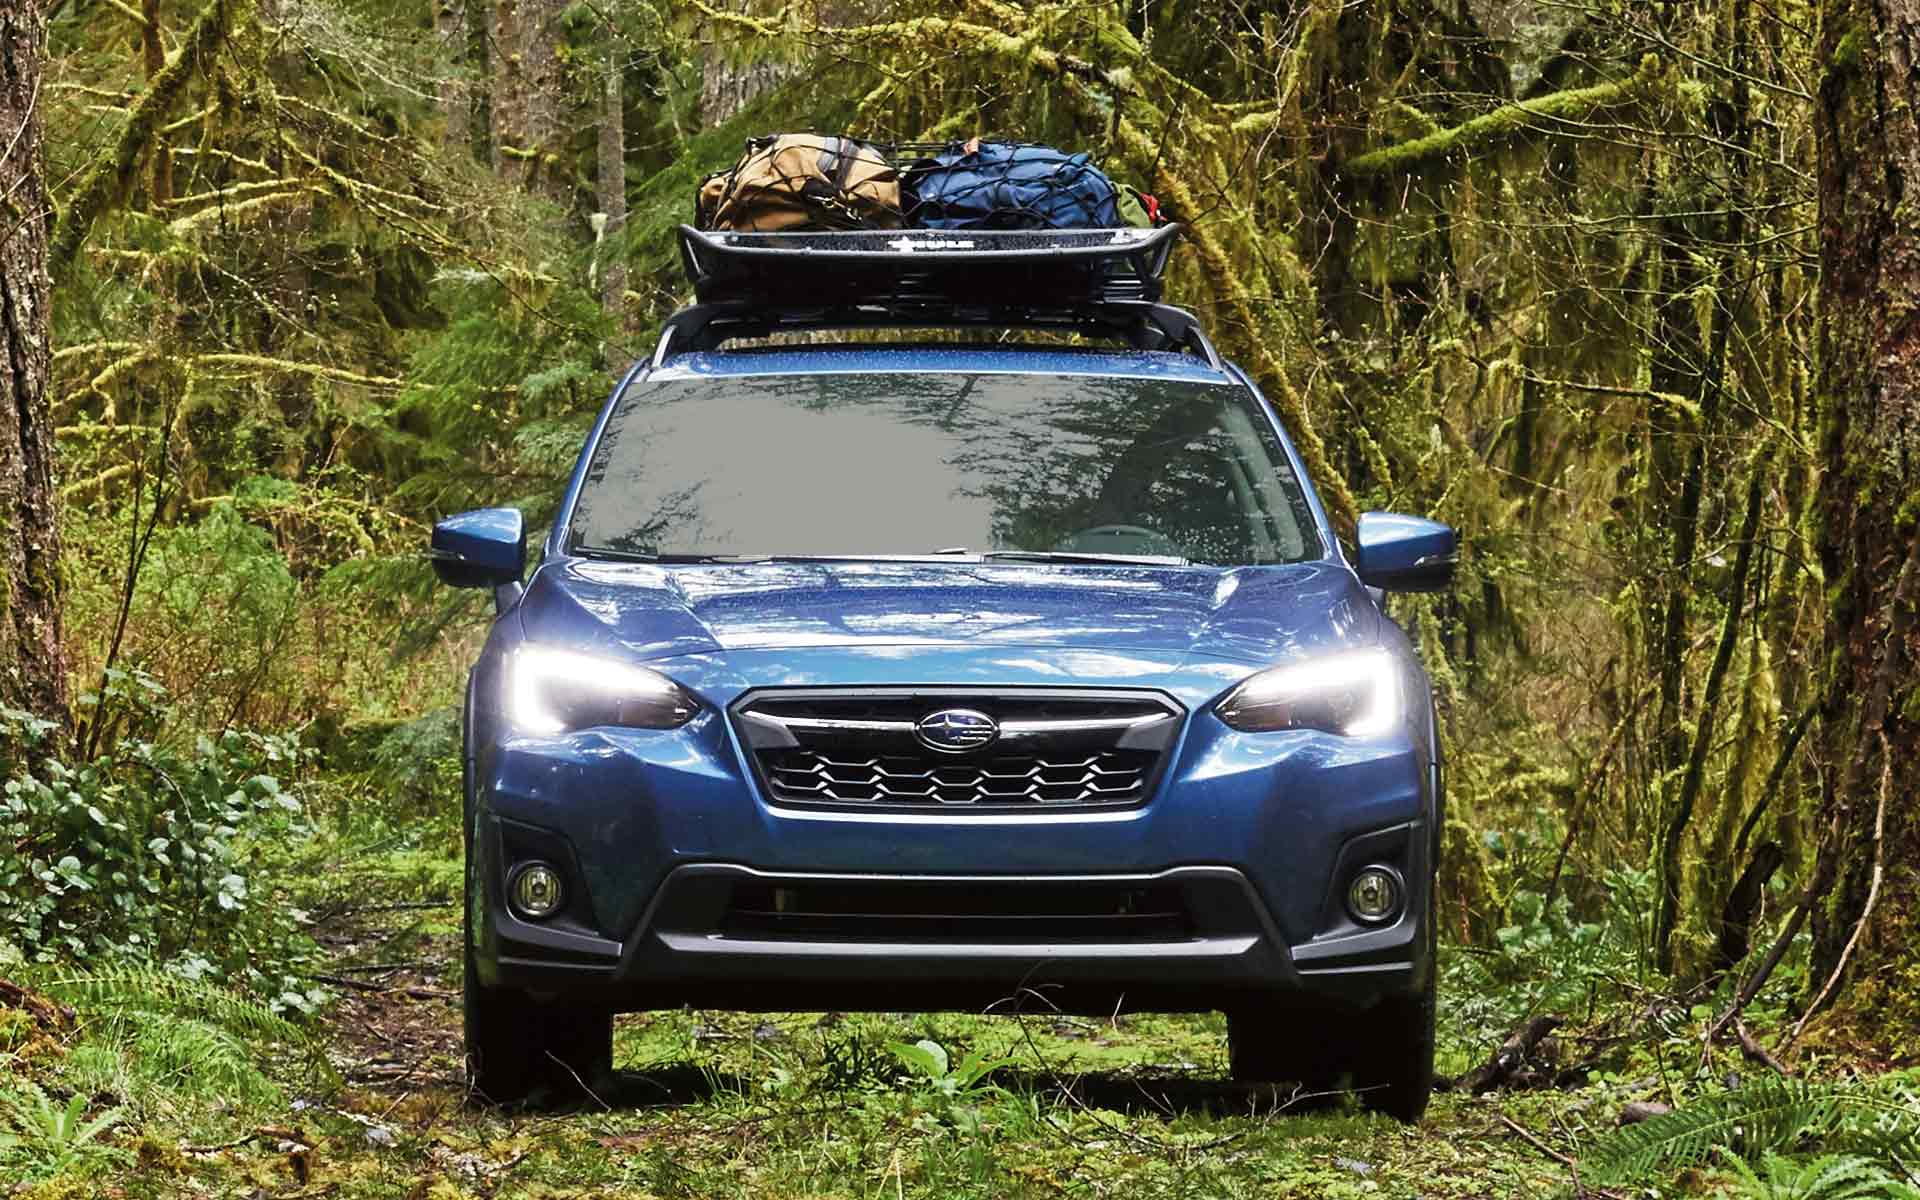 49 New Subaru Xv 2019 New Review by Subaru Xv 2019